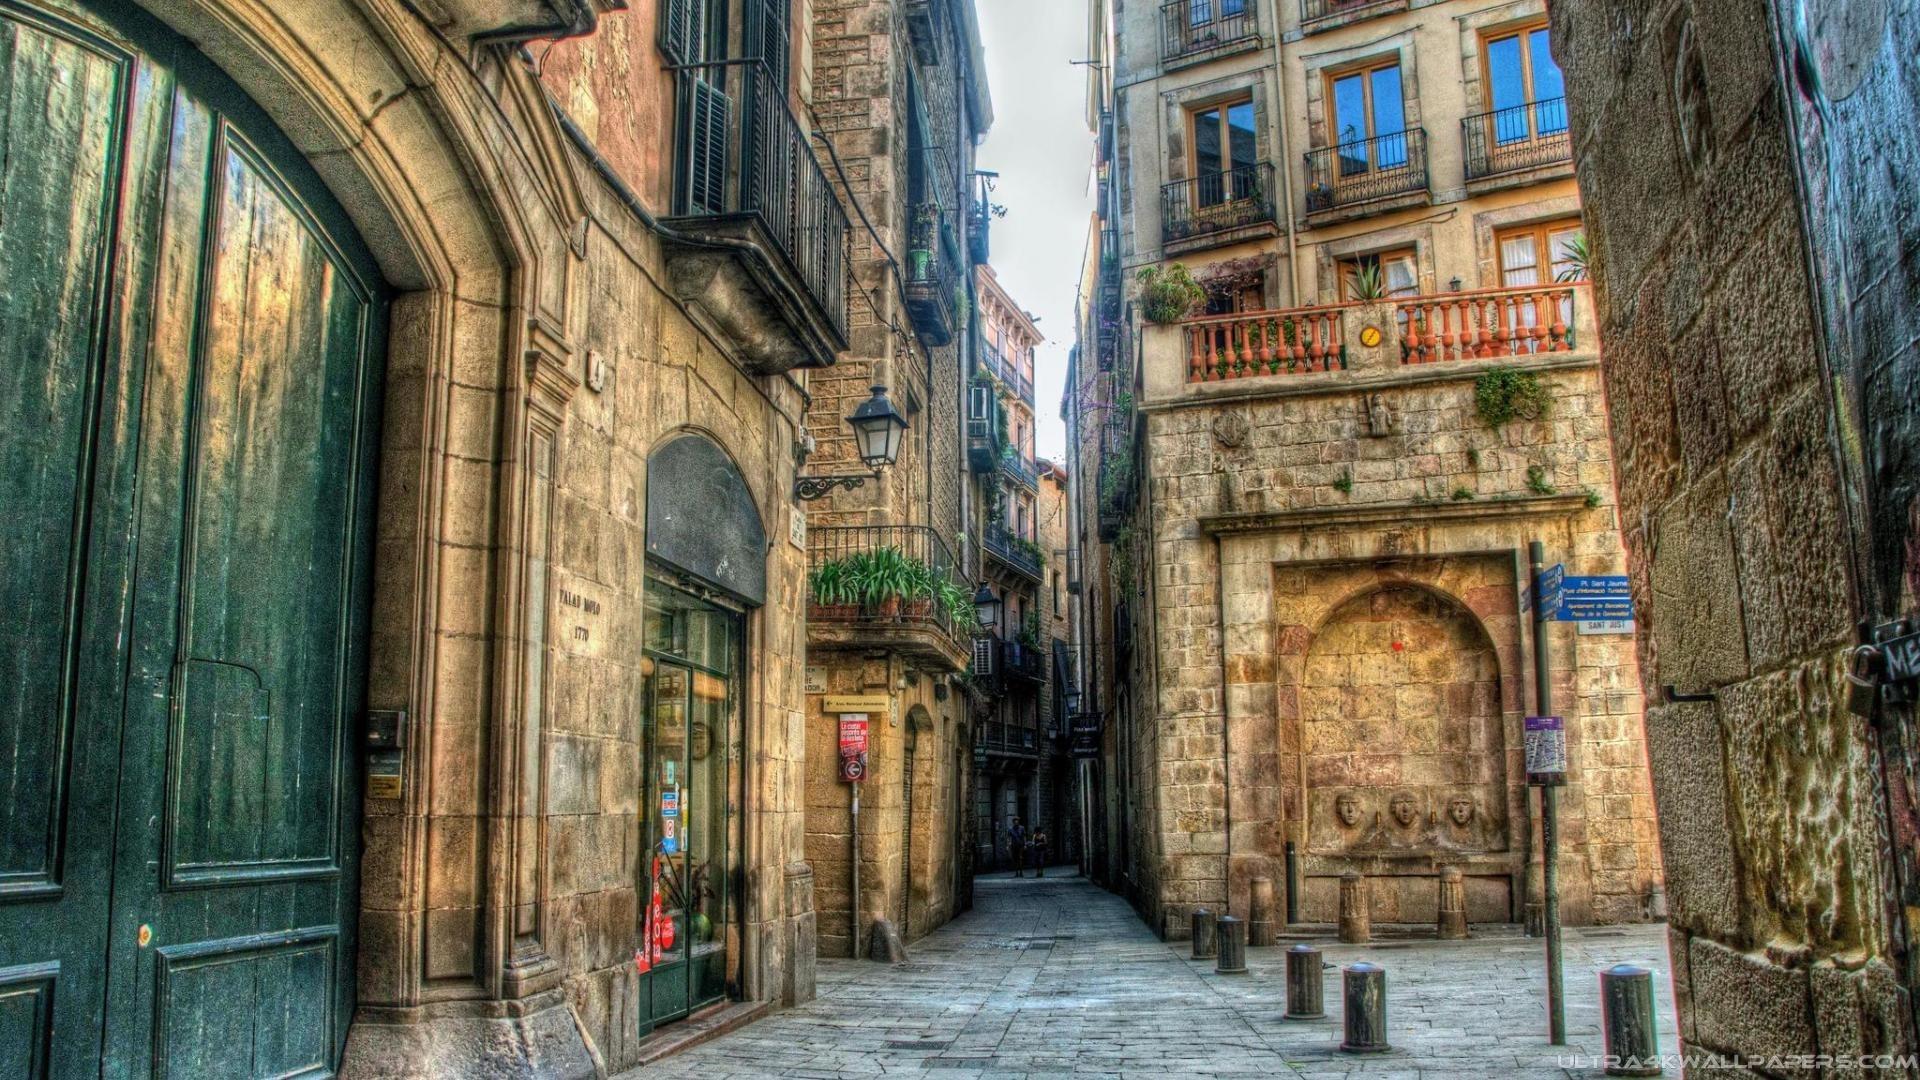 Barcelona-Spain-1920x1080-wallpaper-wpc9002584